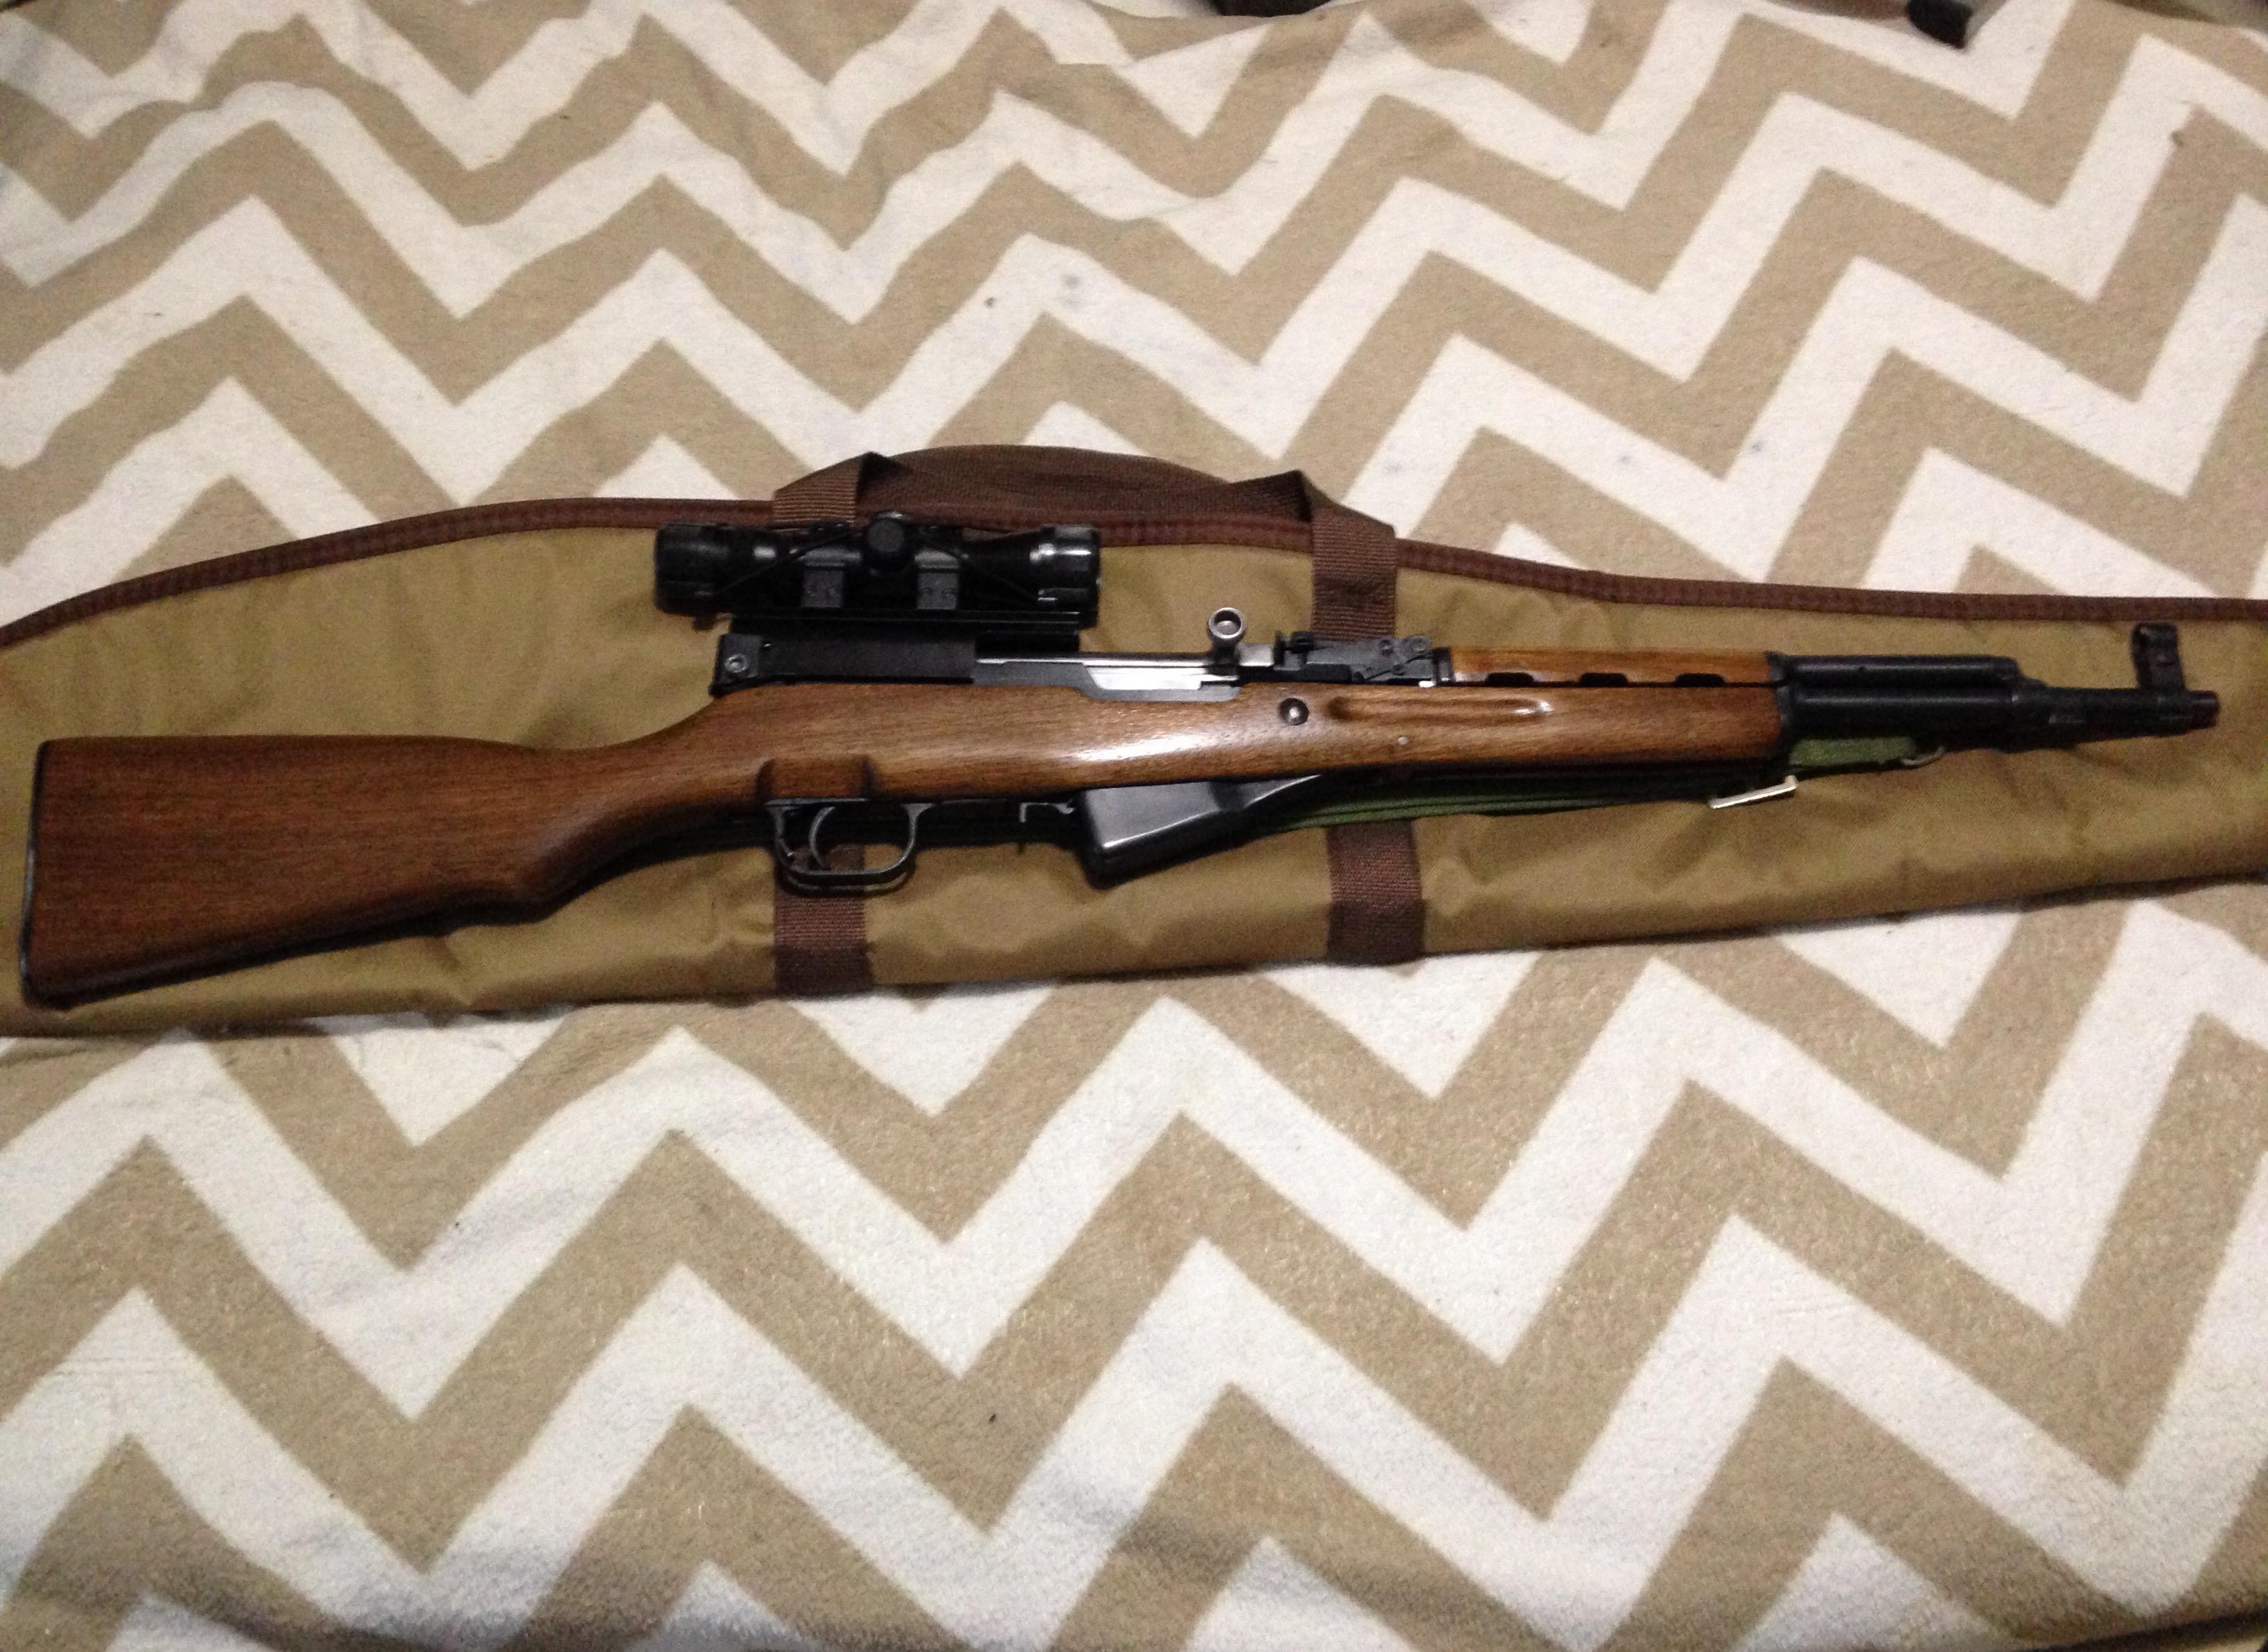 SKS stock refinished | Gun and Game - The Friendliest Gun